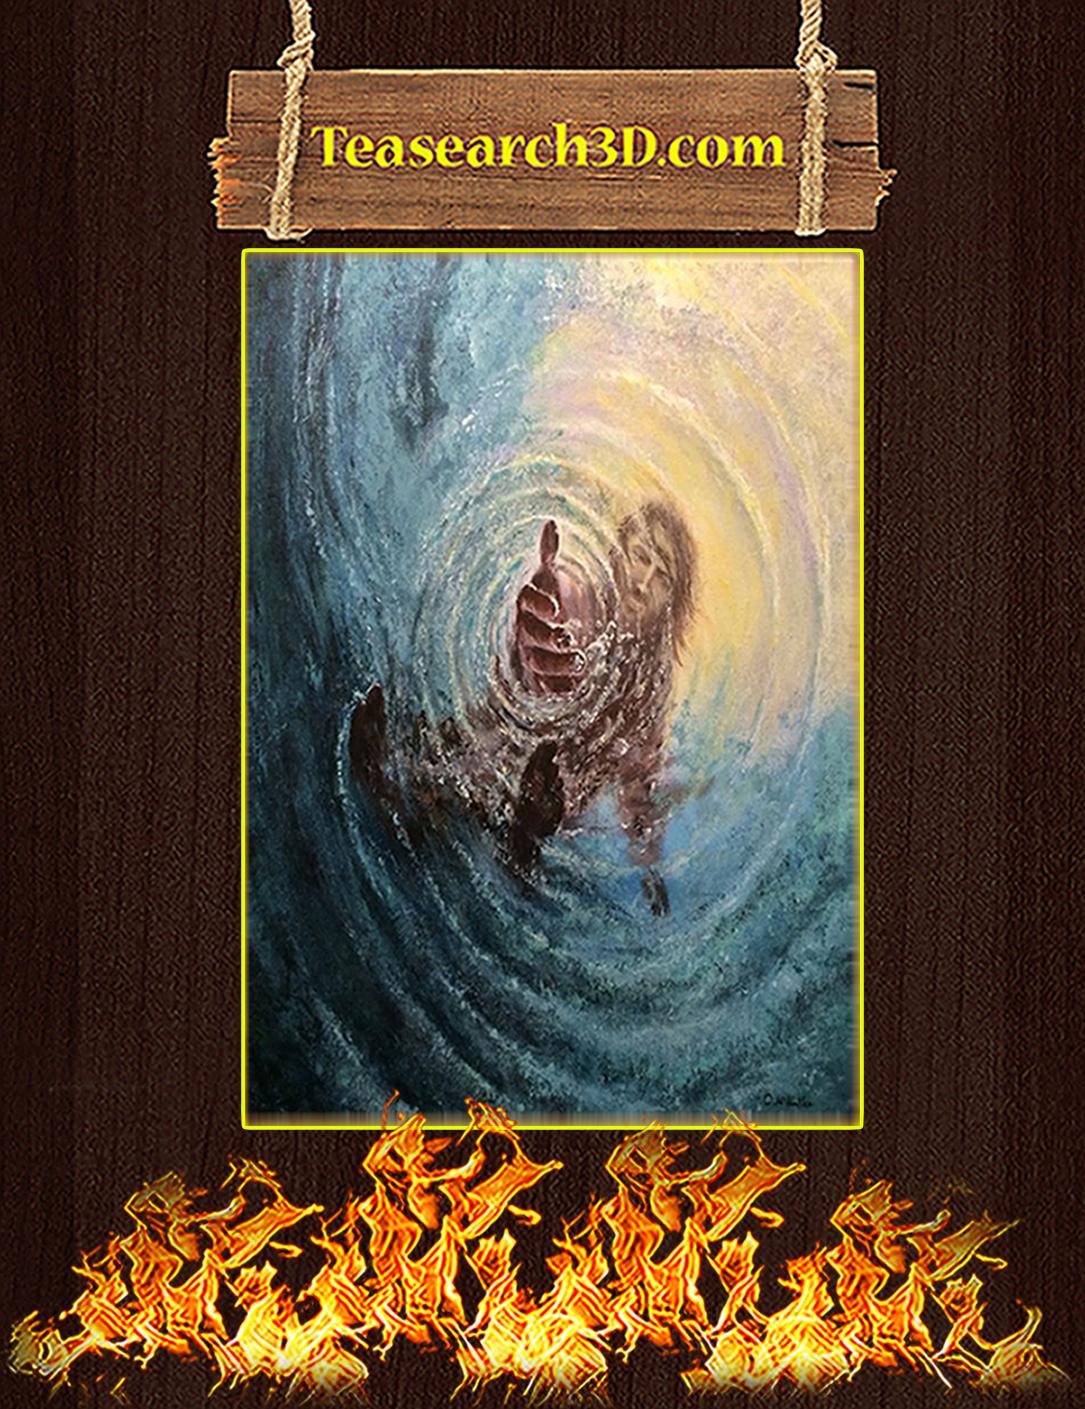 Jesus Save Me Poster A2